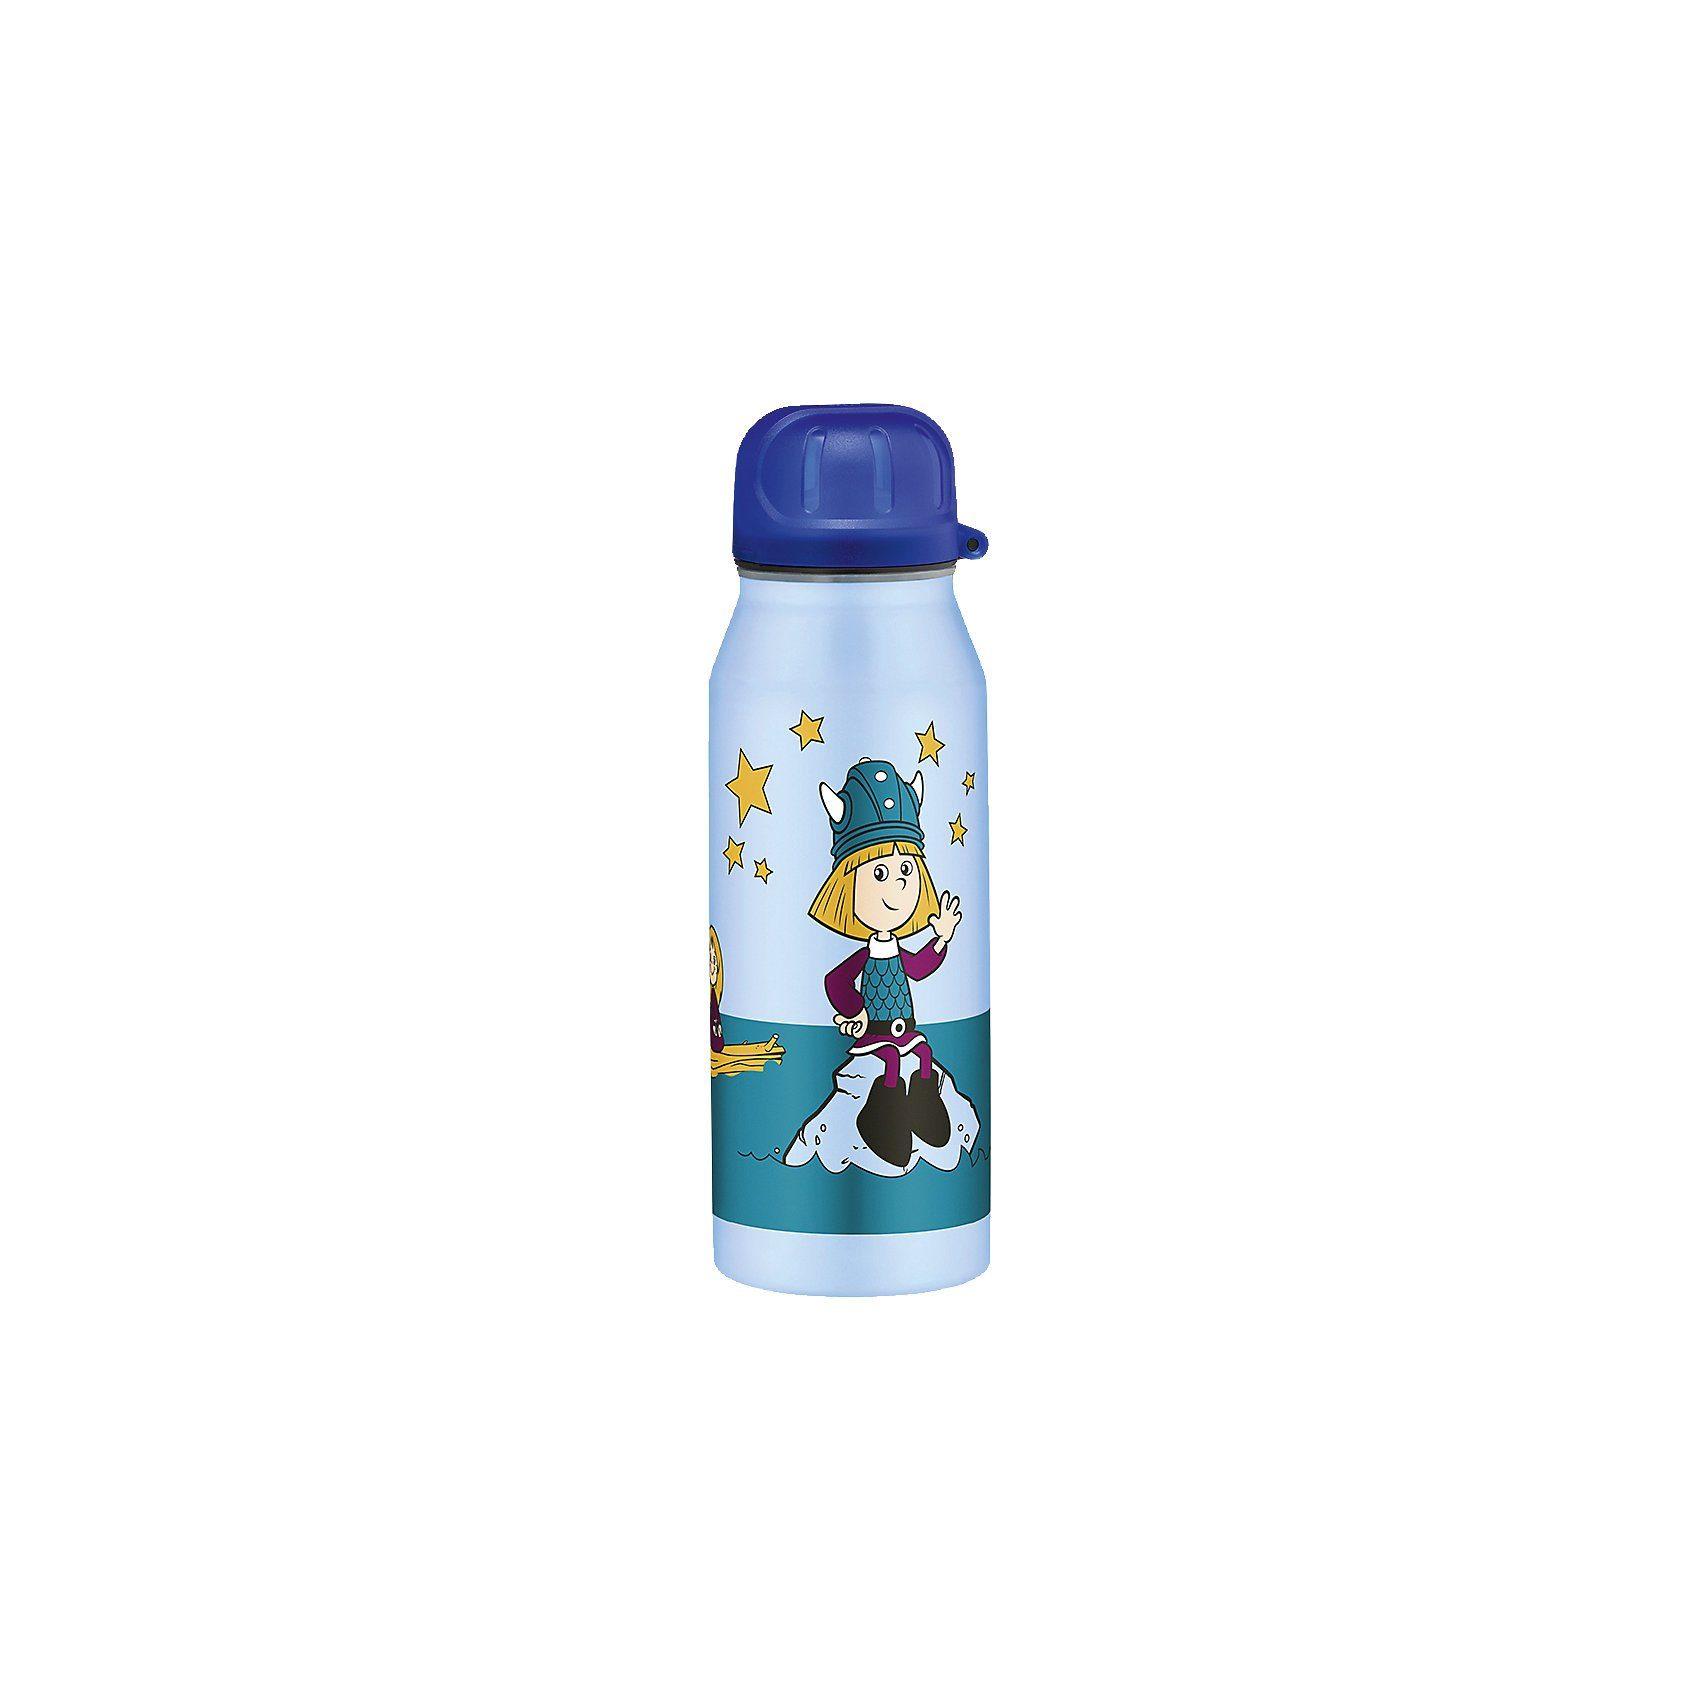 Alfi Isolier-Trinkflasche Wickie blau, 350 ml